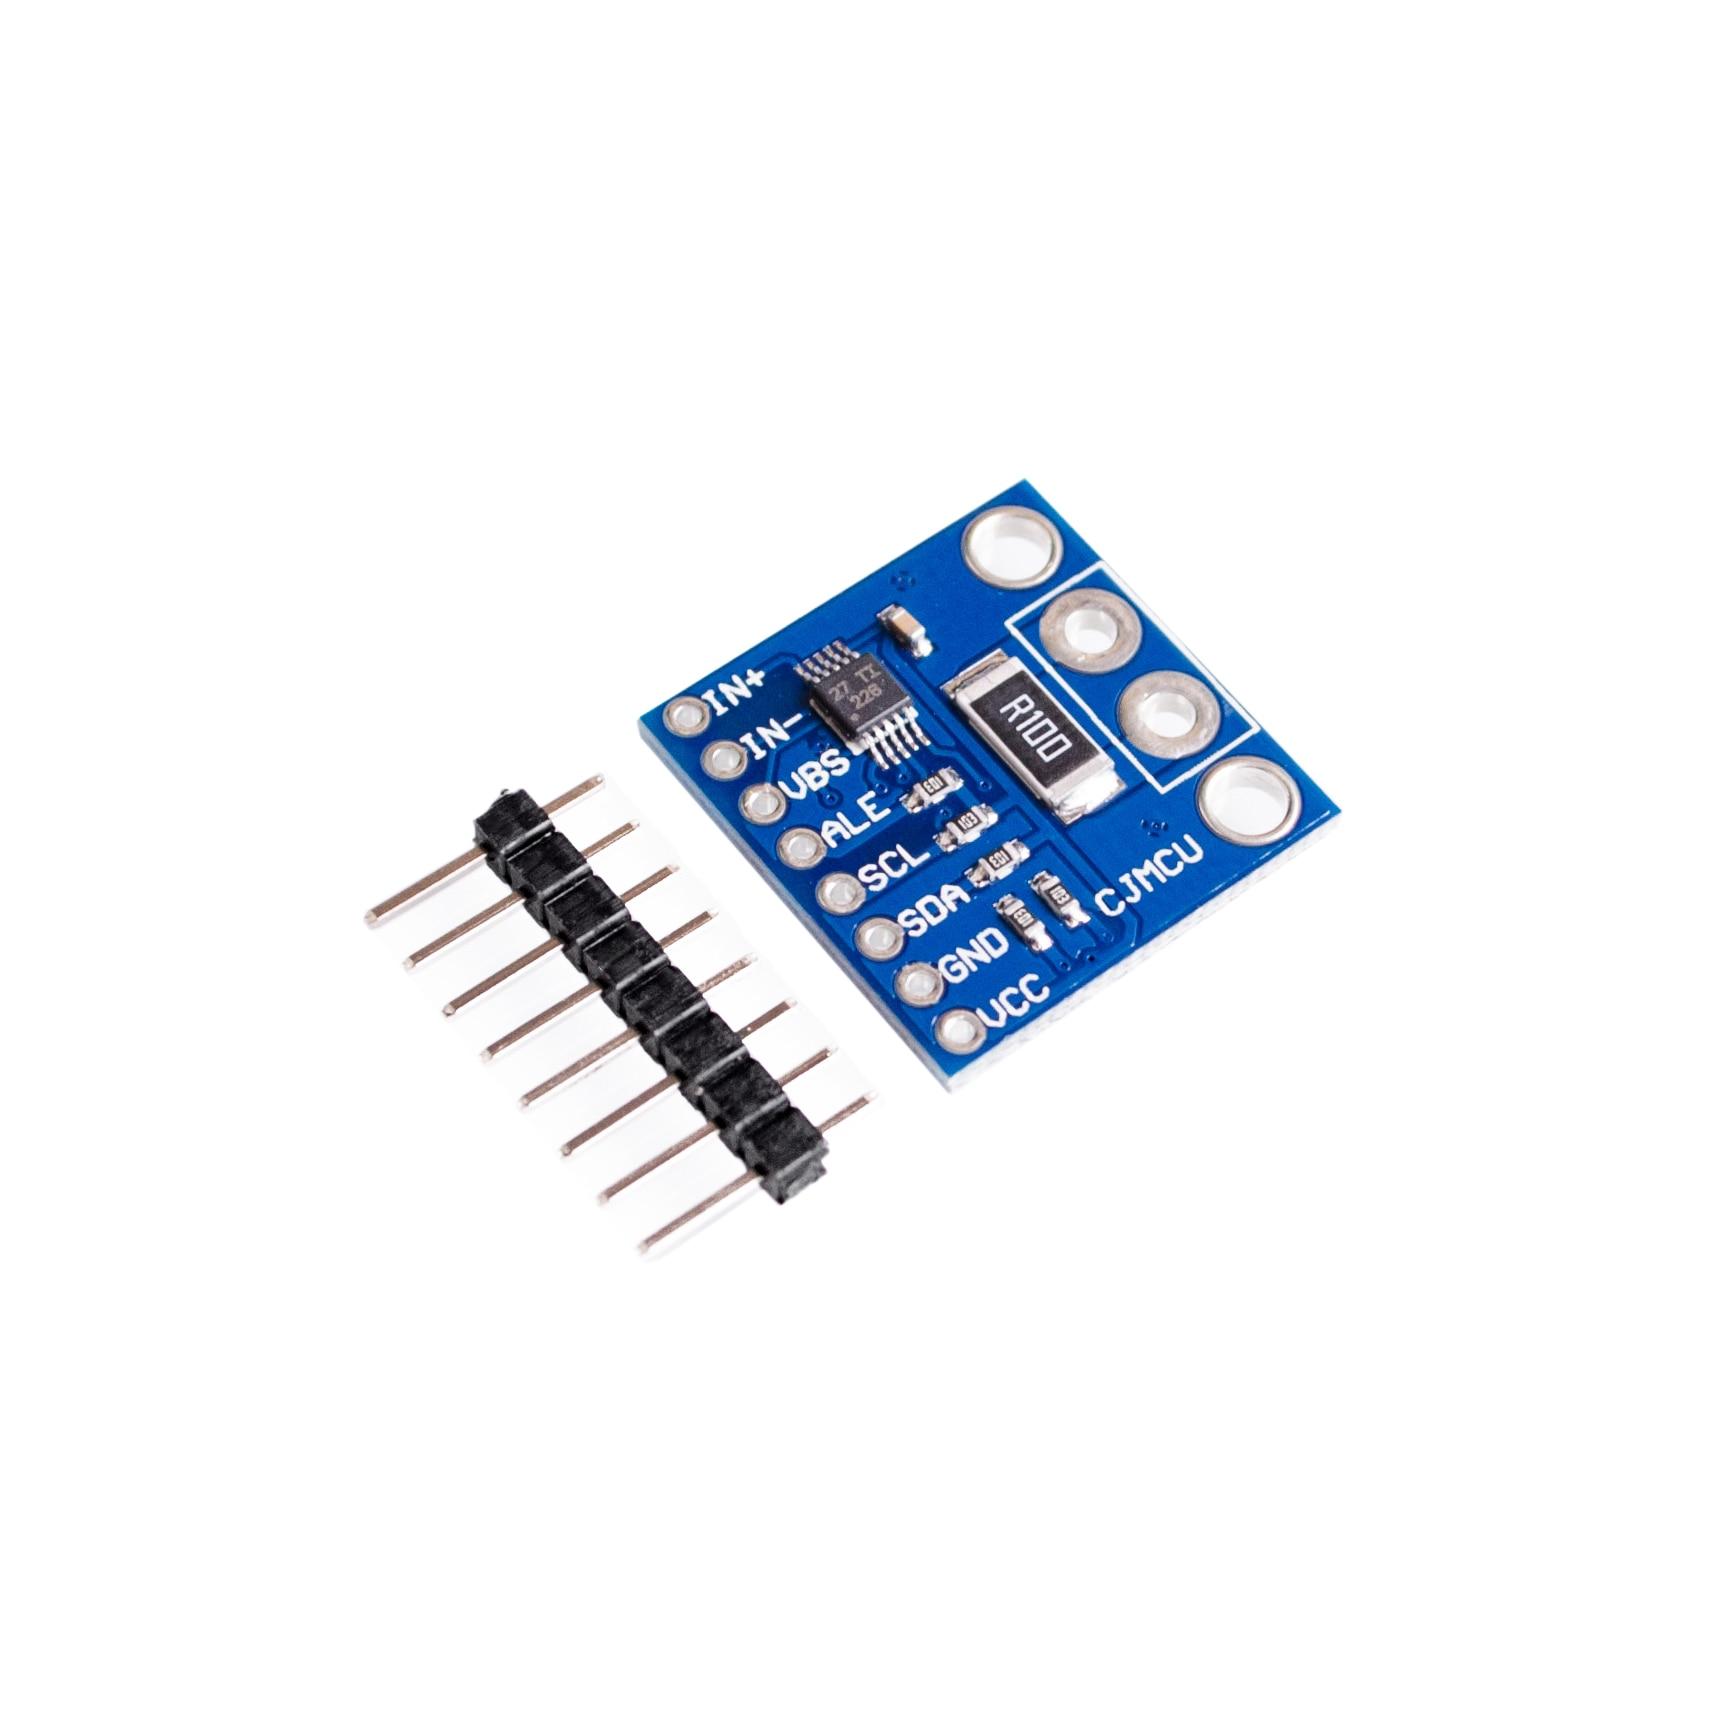 226 INA226 IIC Interface Bi-directional Current/power Monitoring Sensor Module